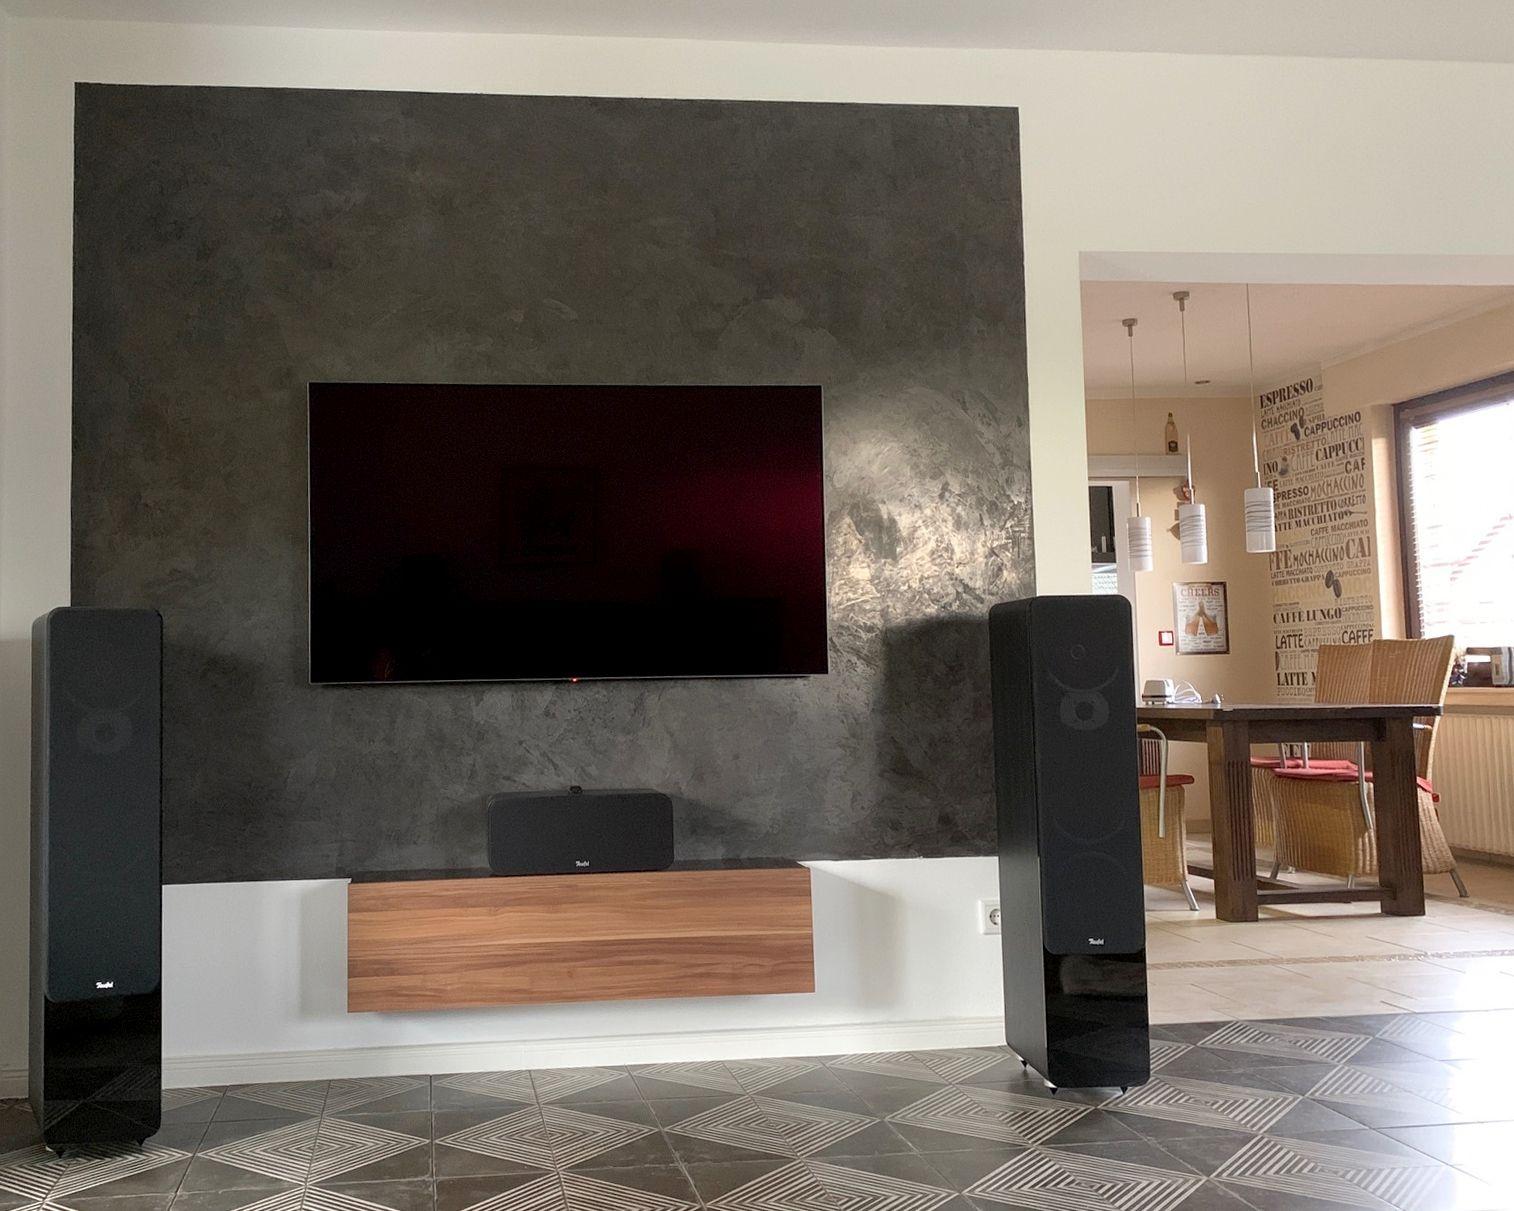 Stucco Veneziano Komplett Set Für Einsteiger Stucco Naturale Sets Tv Wand Haus Ideen